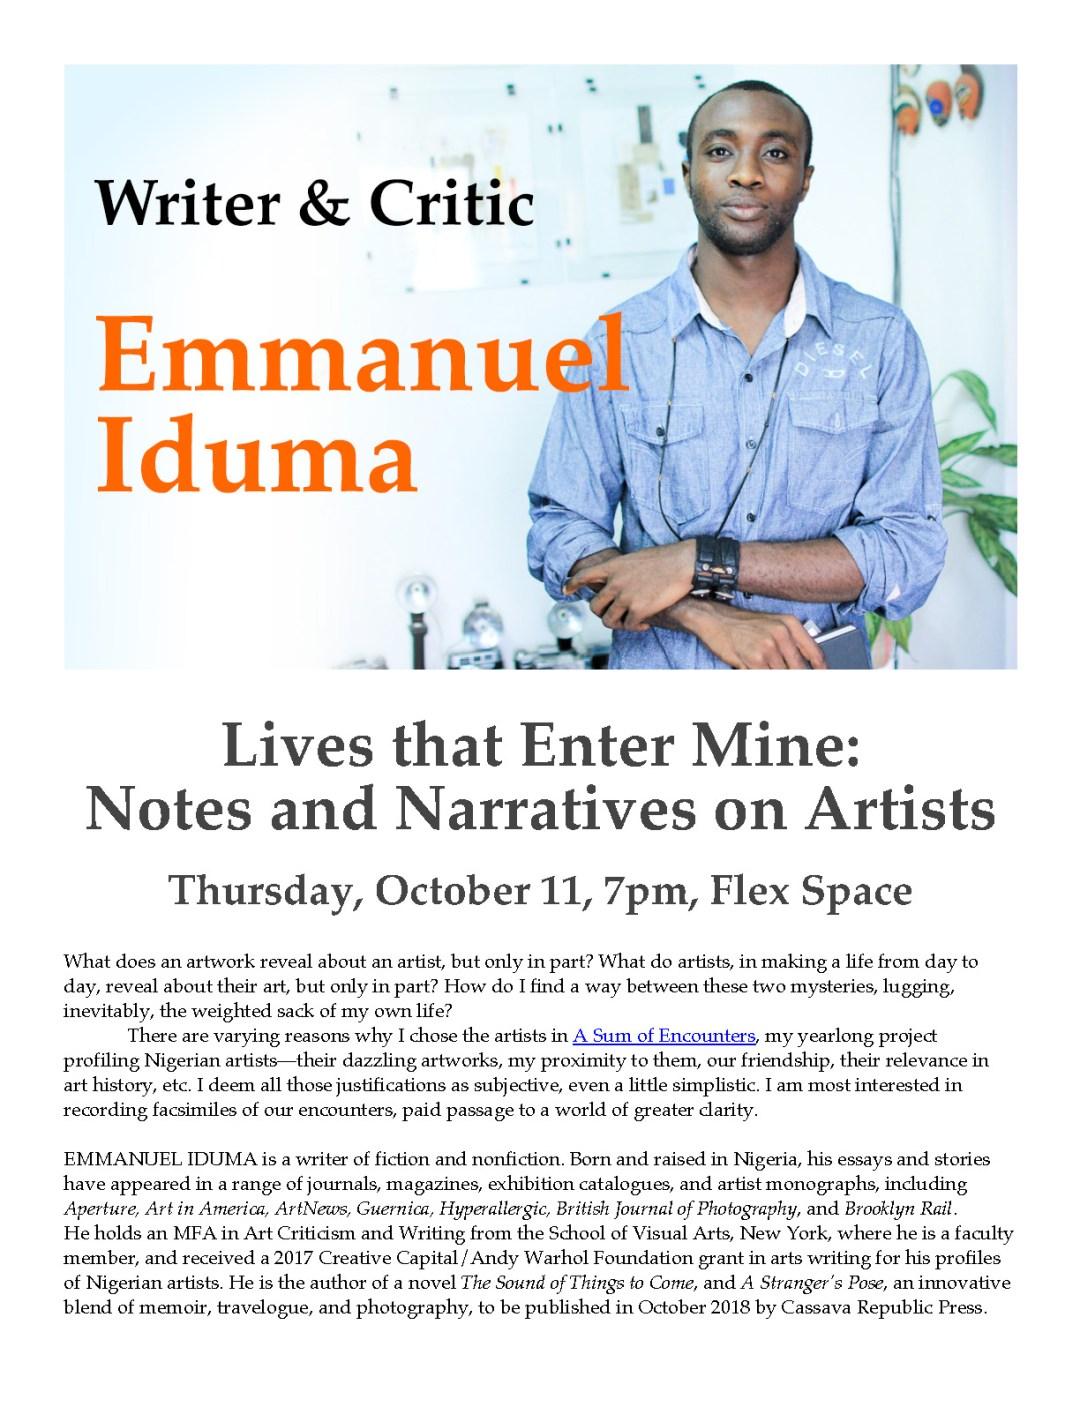 Emmanuel Iduma_10-11-18.jpg